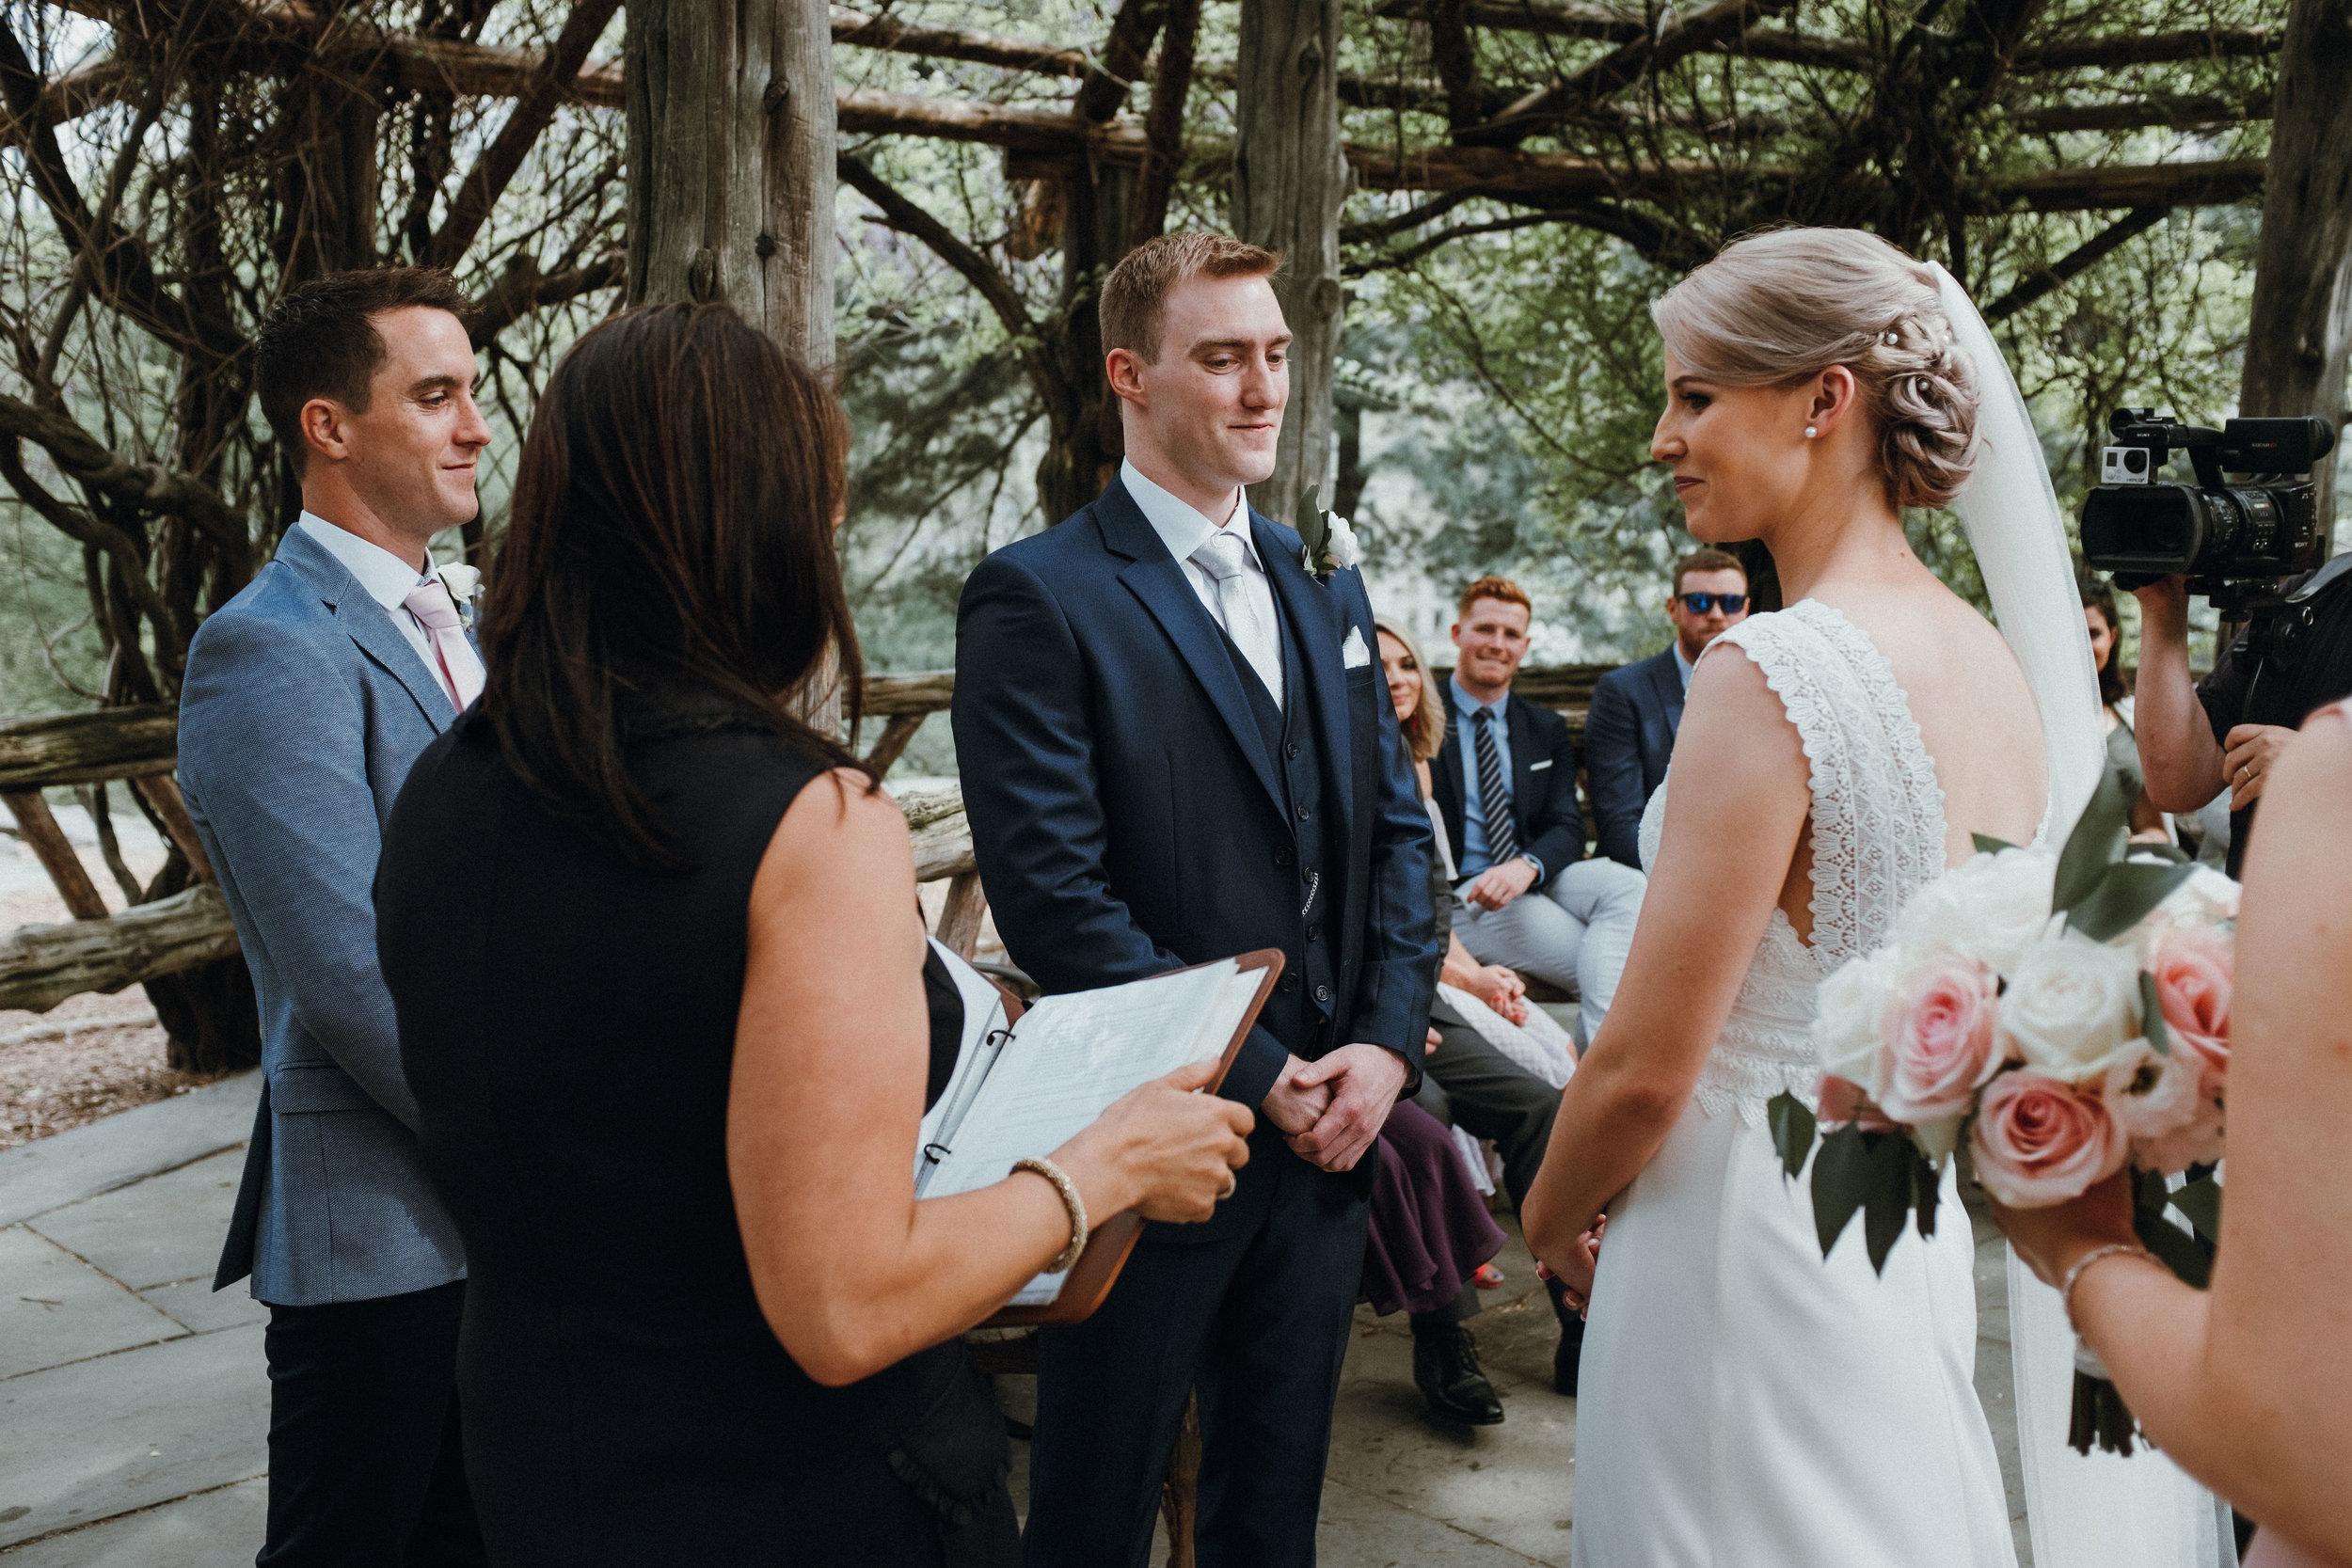 Wedding ceremony in cop cot